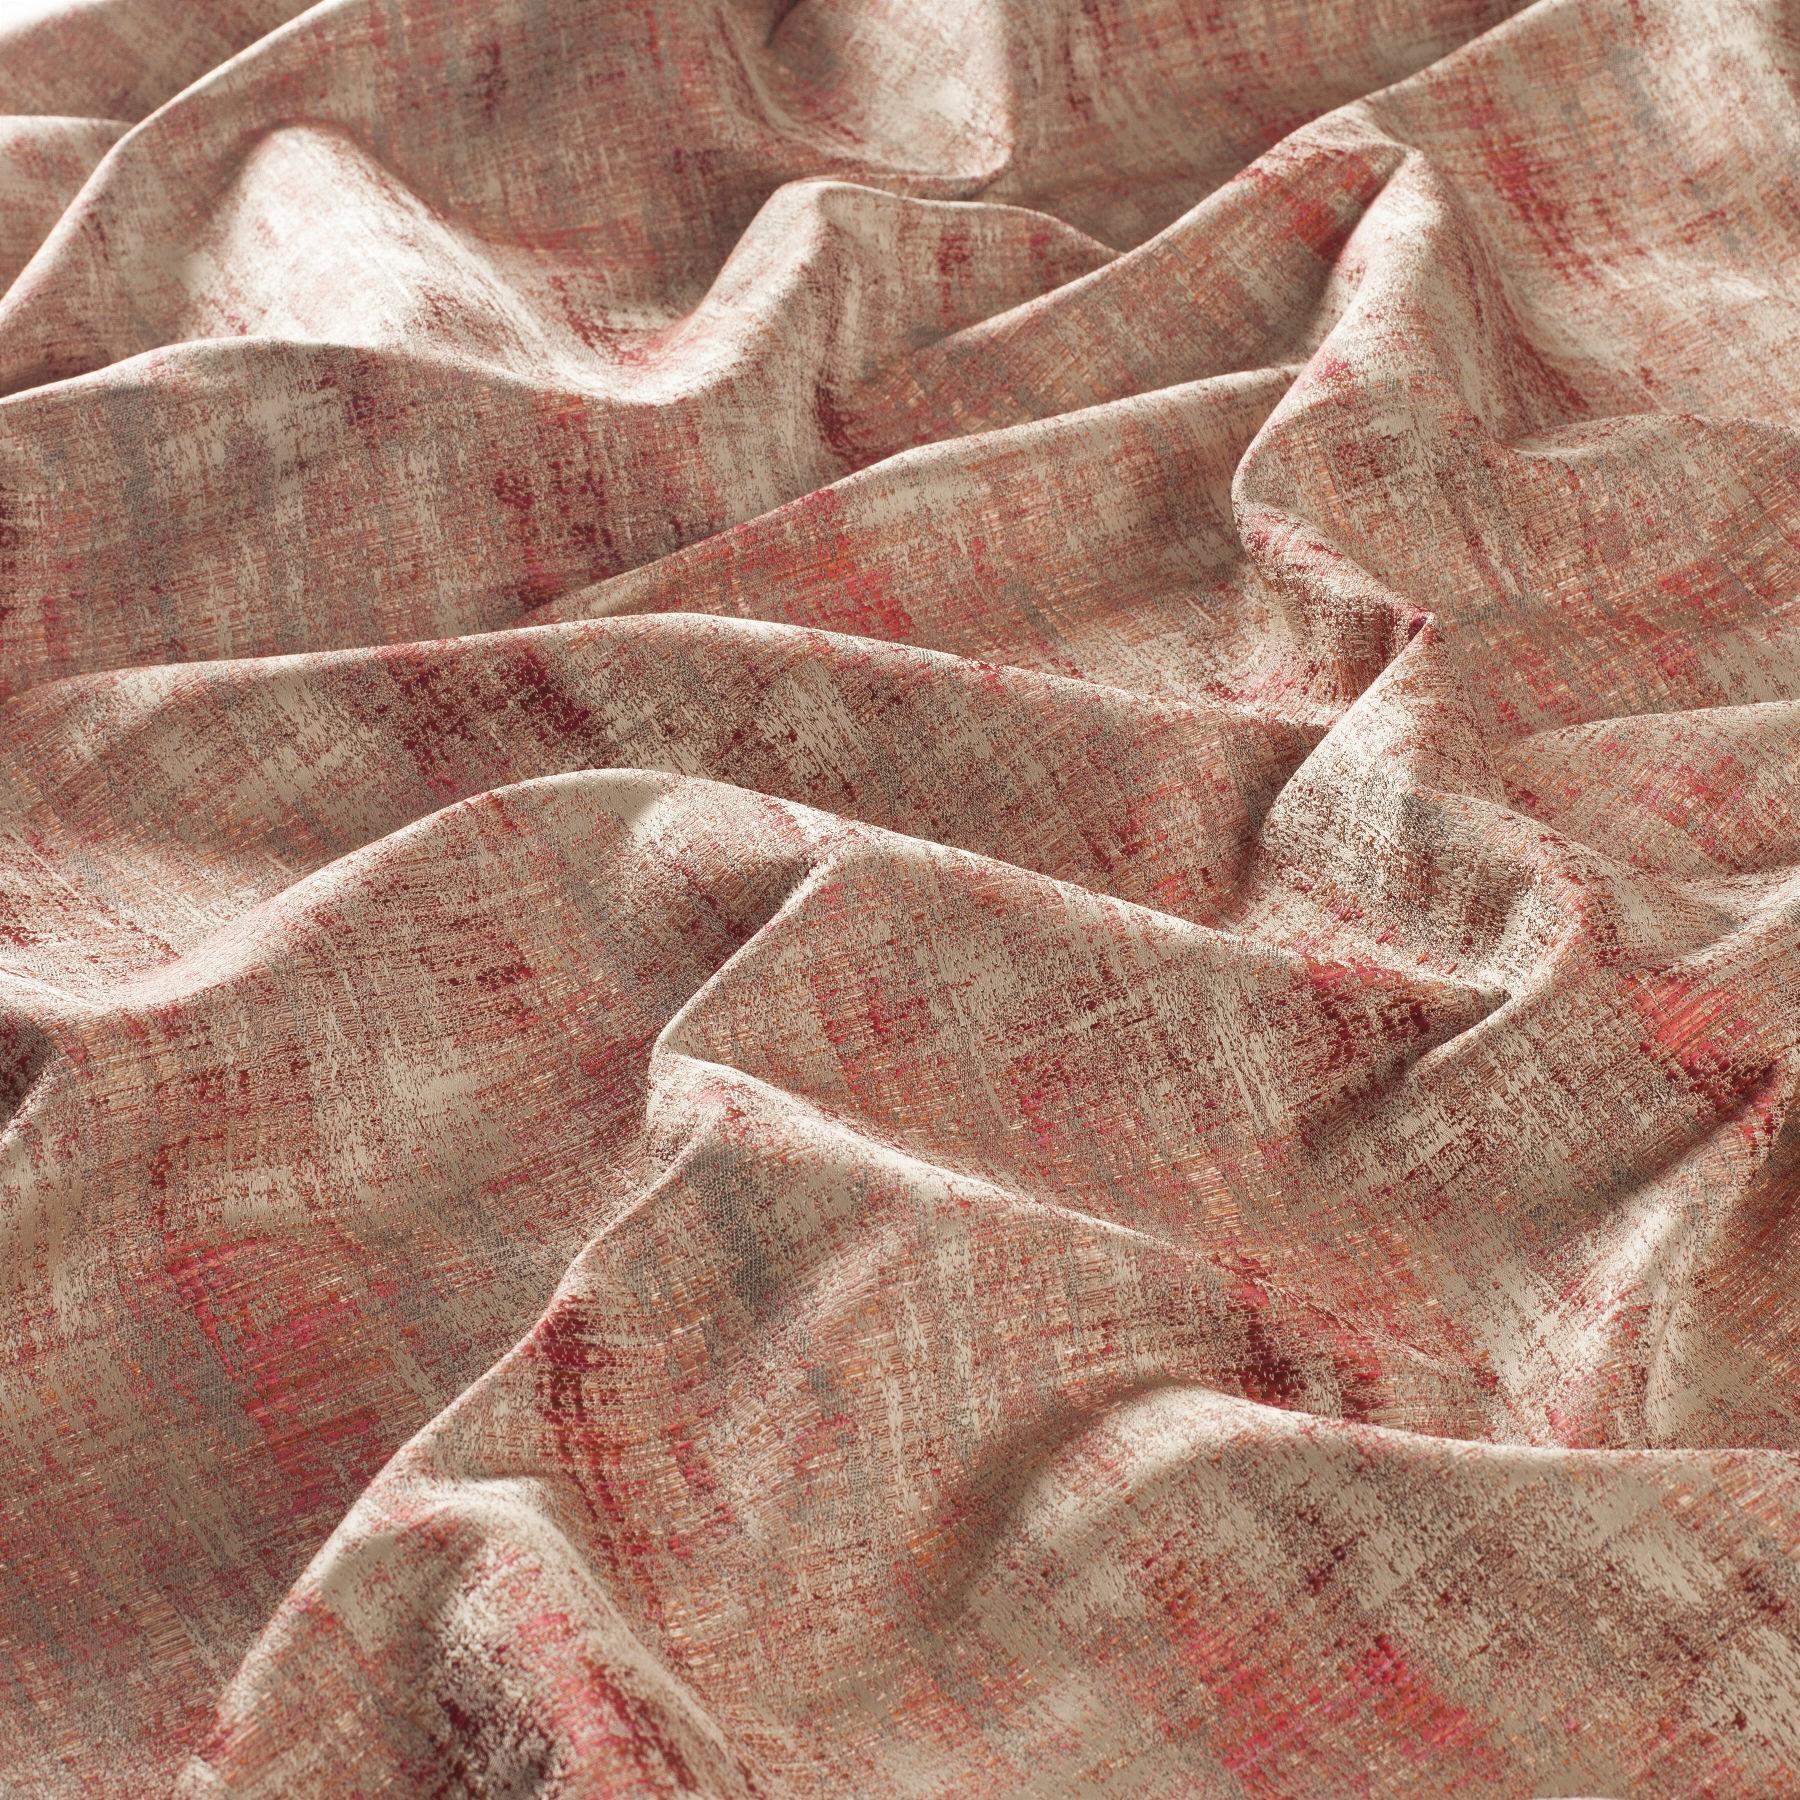 Decoration Fabric Kalahari 9 7877 061 Jab Anstoetz Fabrics